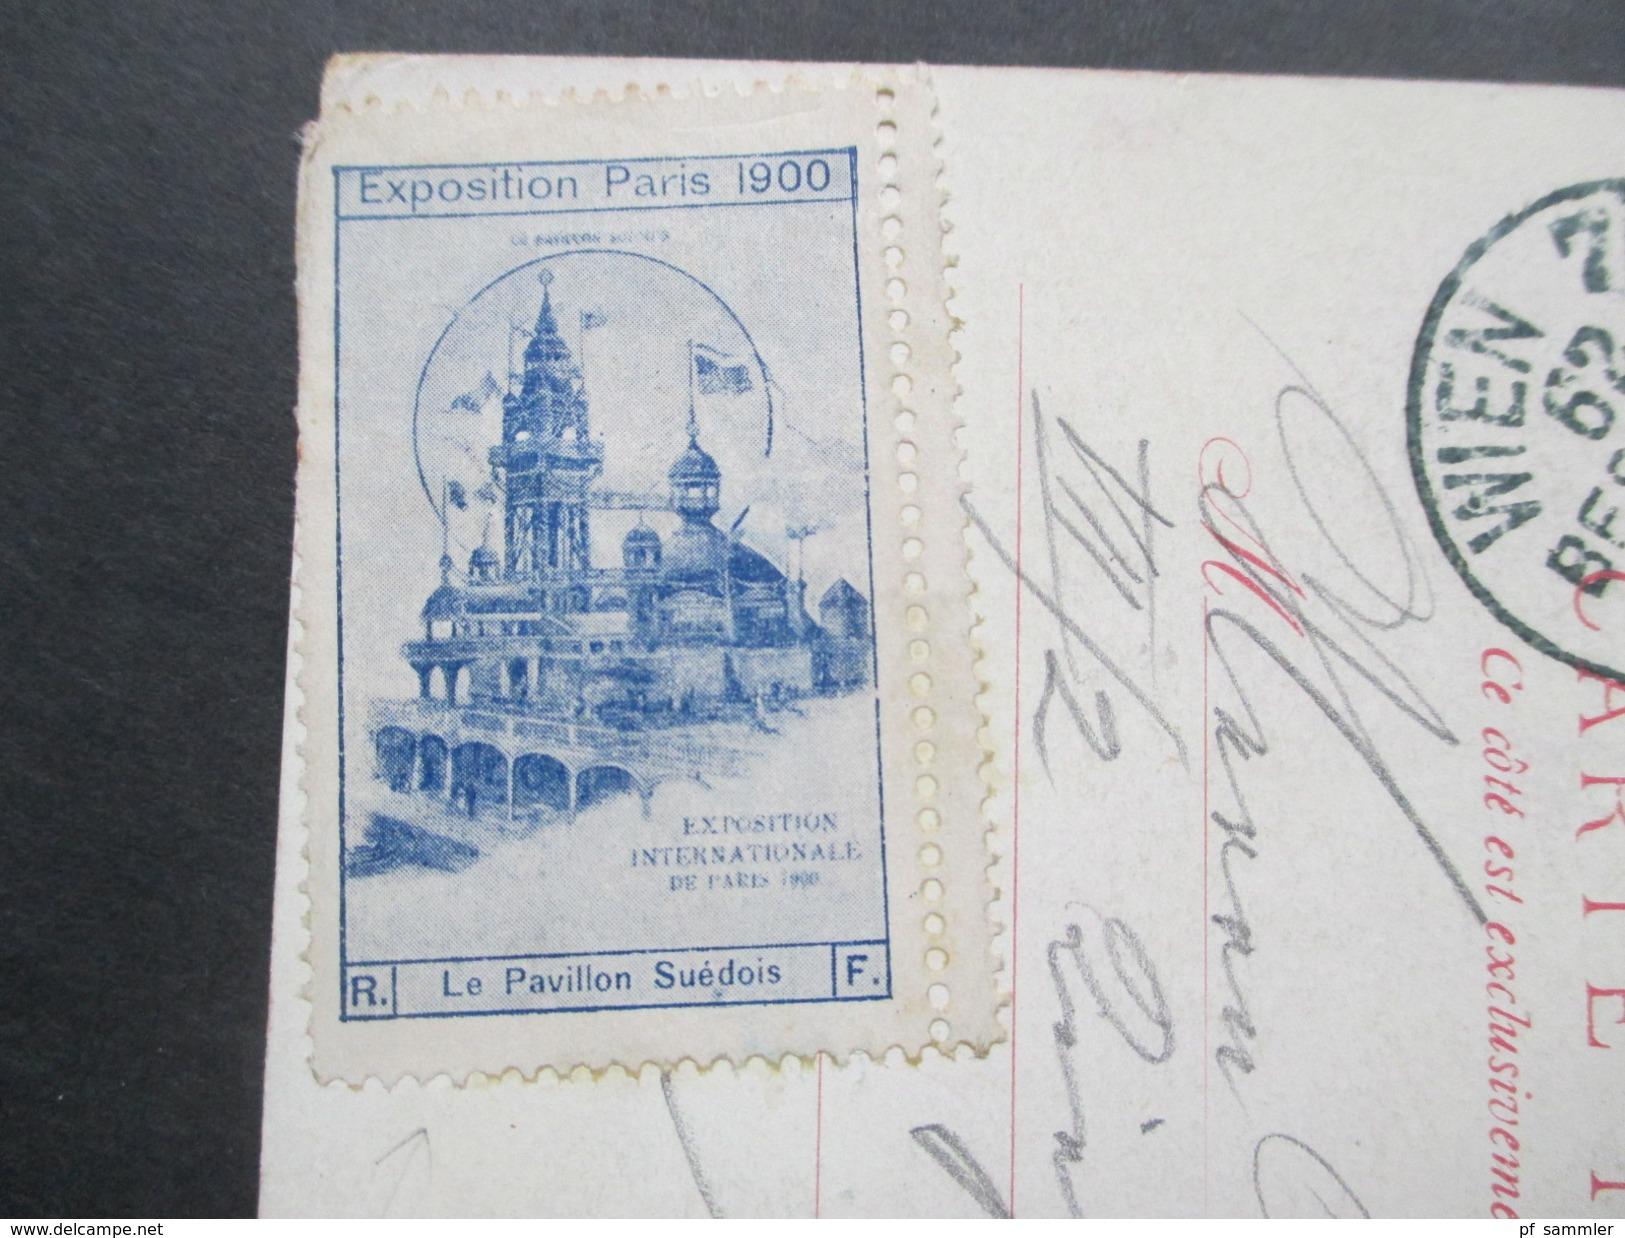 AK / Künstlerkarte 1900 Hotel De Ville. Vignette Exposition Paris 1900 Le Pavillon Suedois. Nach Wien. Wien 7/2 Bestellt - Hotels & Gaststätten